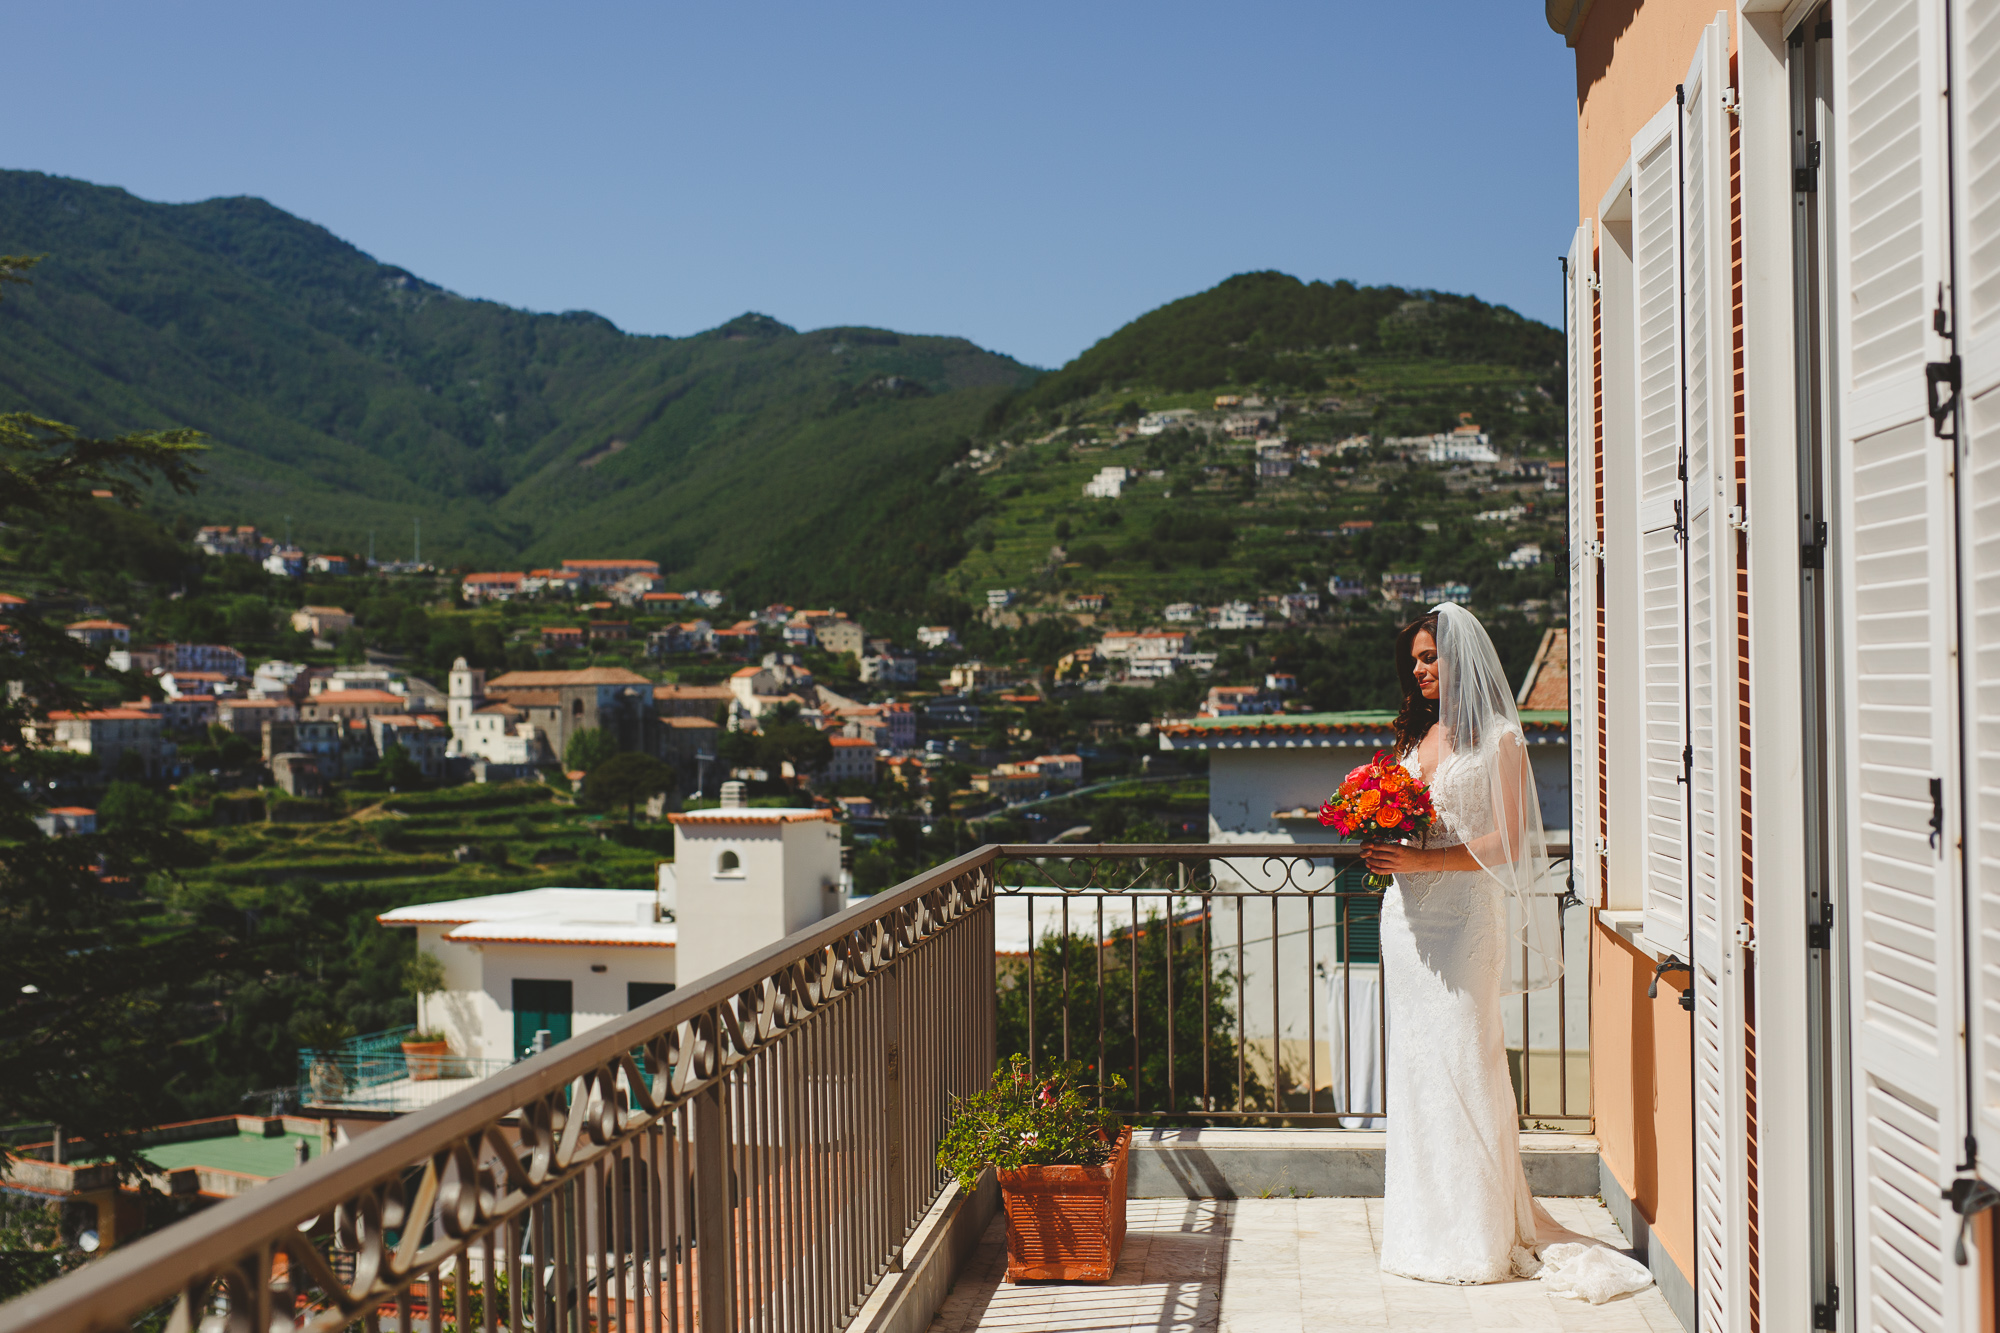 destination-wedding-photography-amalfi-coast-ravello-4.jpg